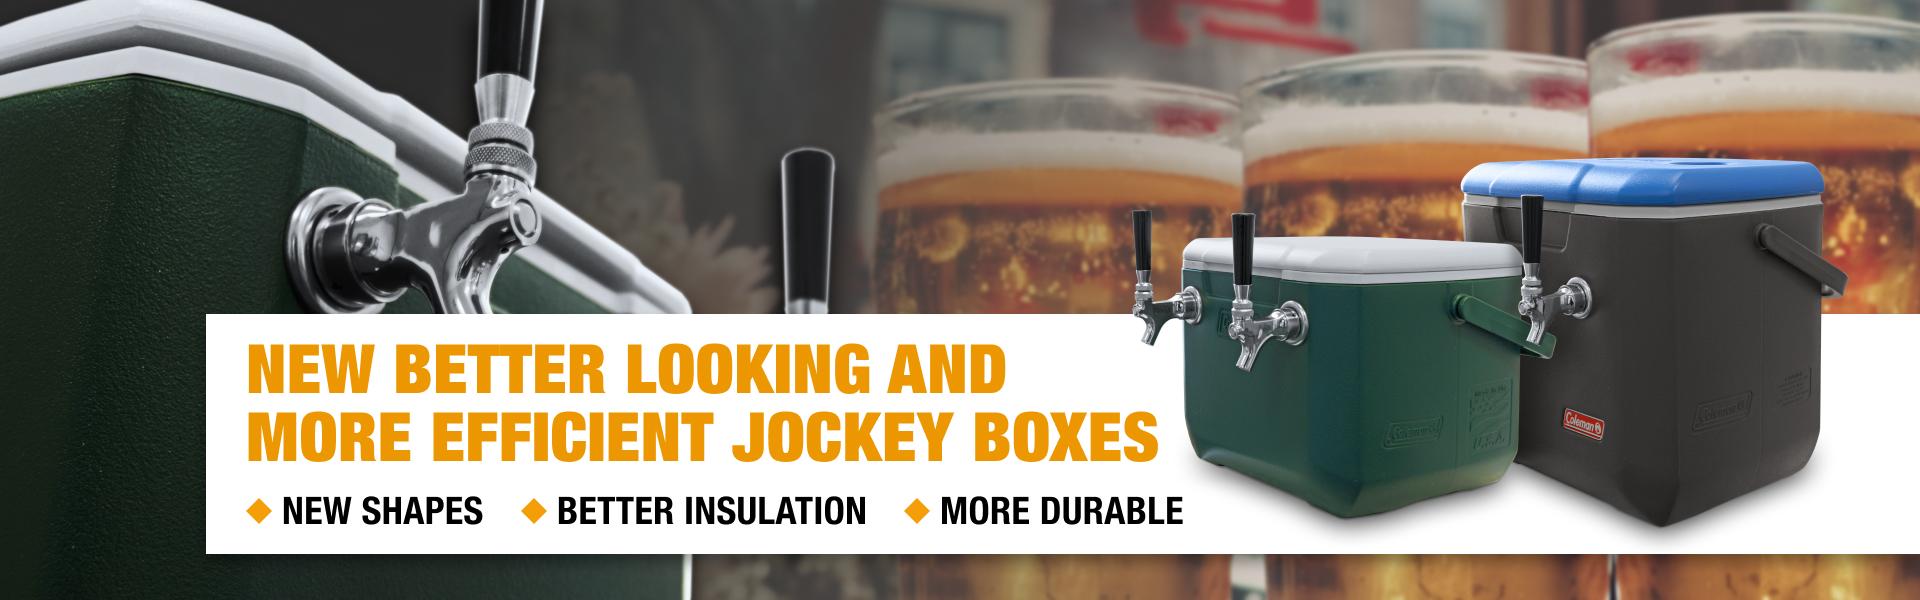 jockey-boxes.jpg